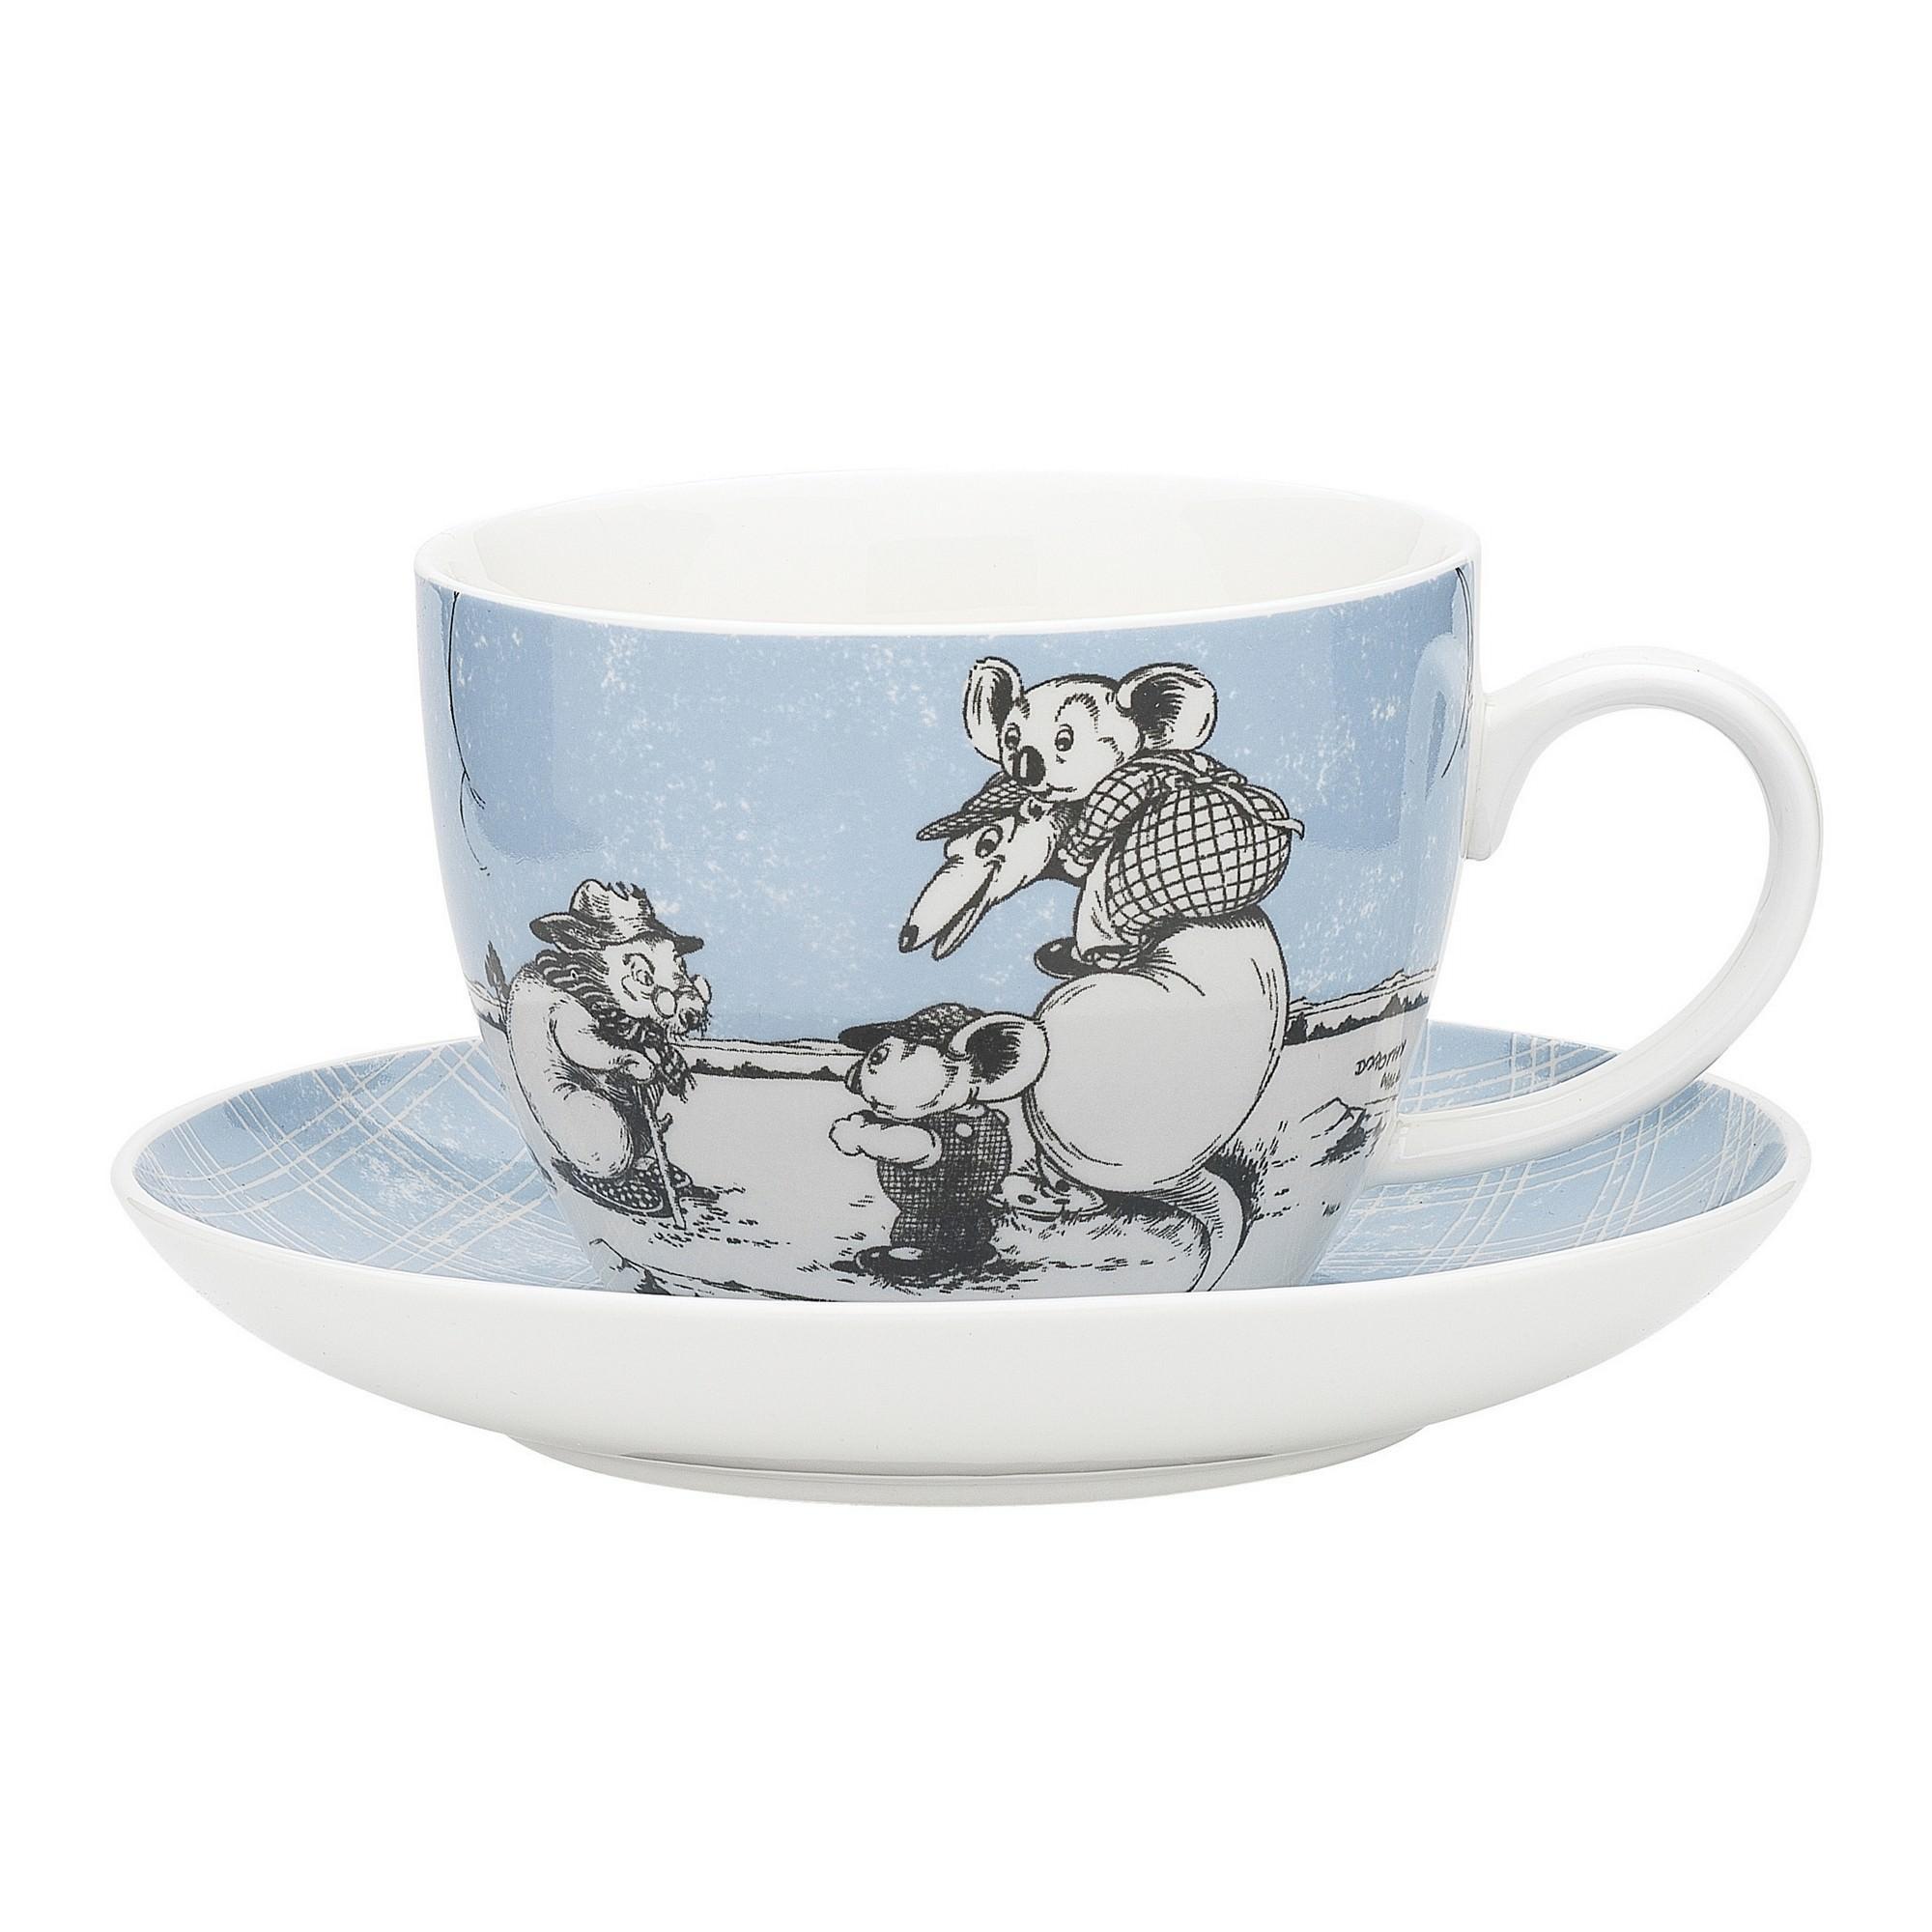 Ecology Blinky Bill New Bone China Cup & Saucer Set, Blue